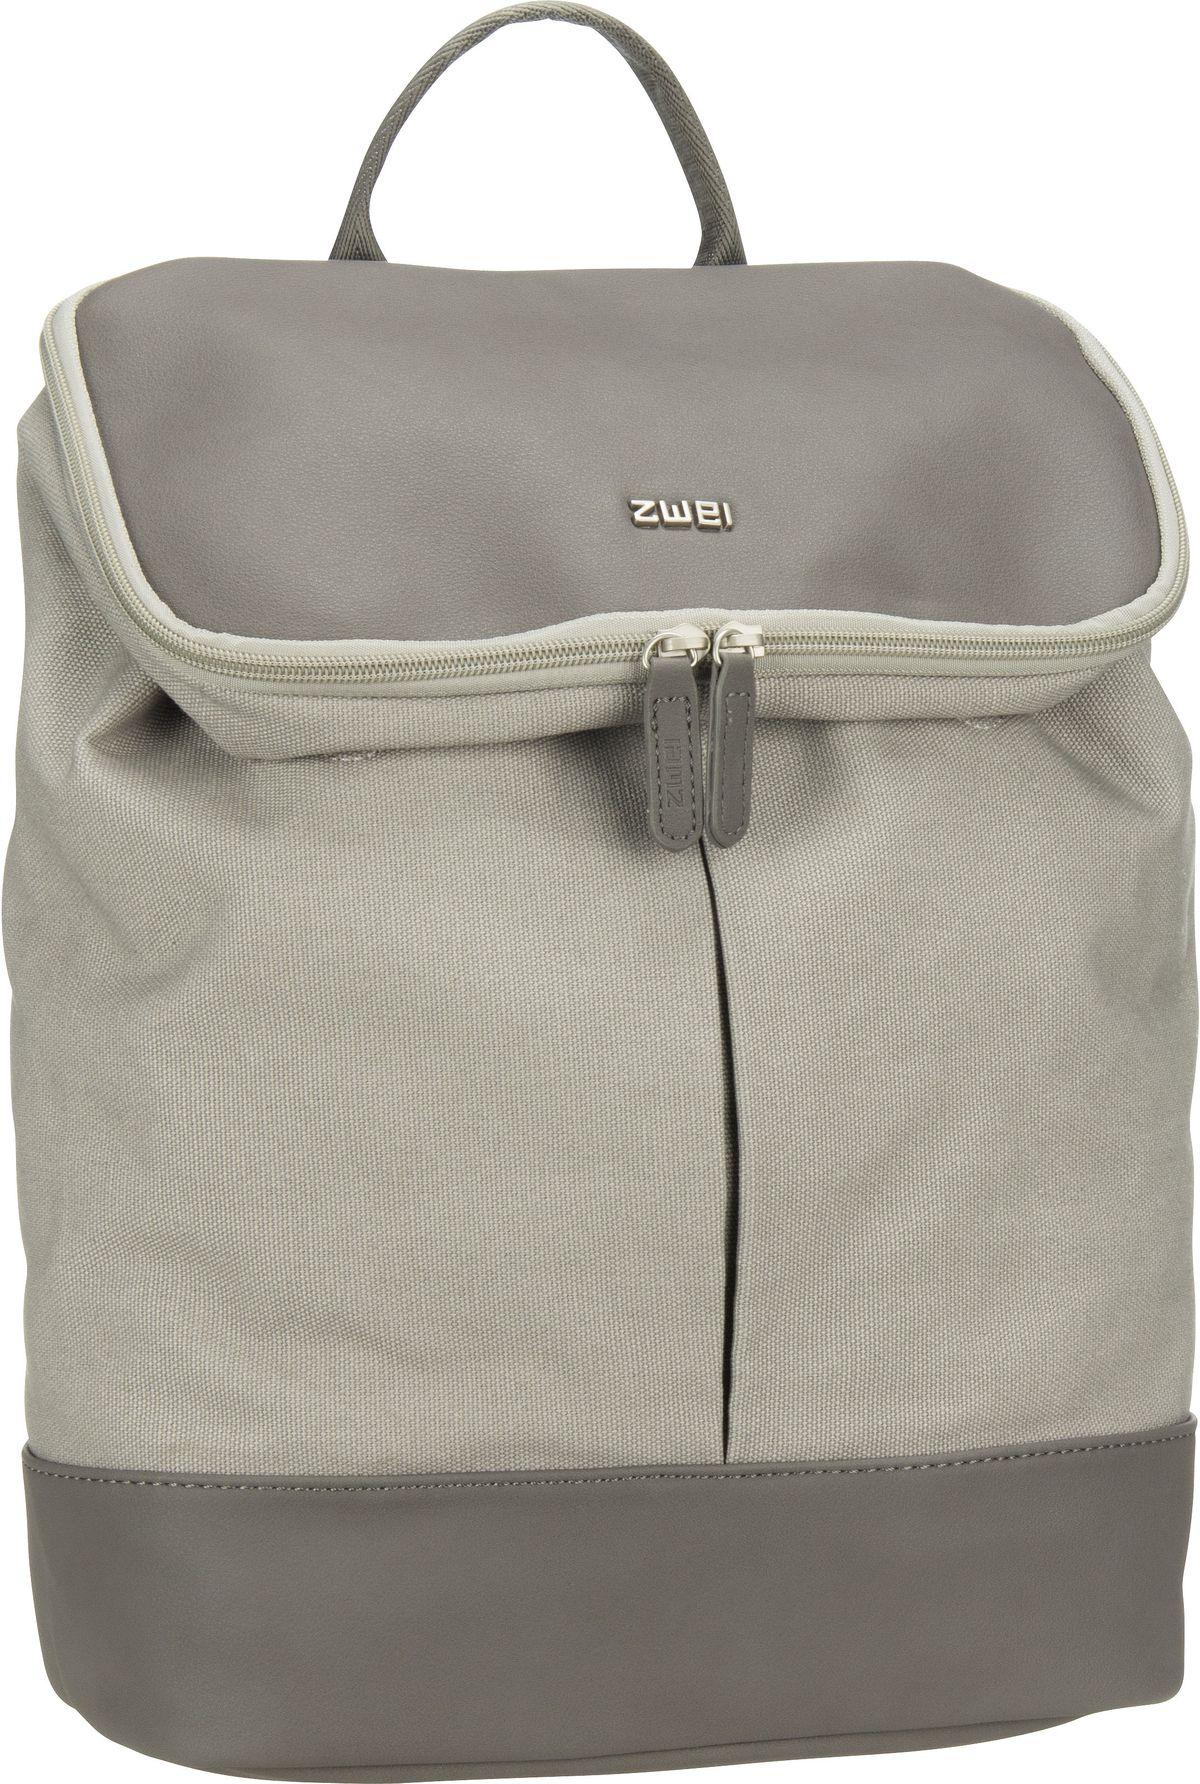 Rucksack / Daypack Paula PAR140 Grey (10 Liter)